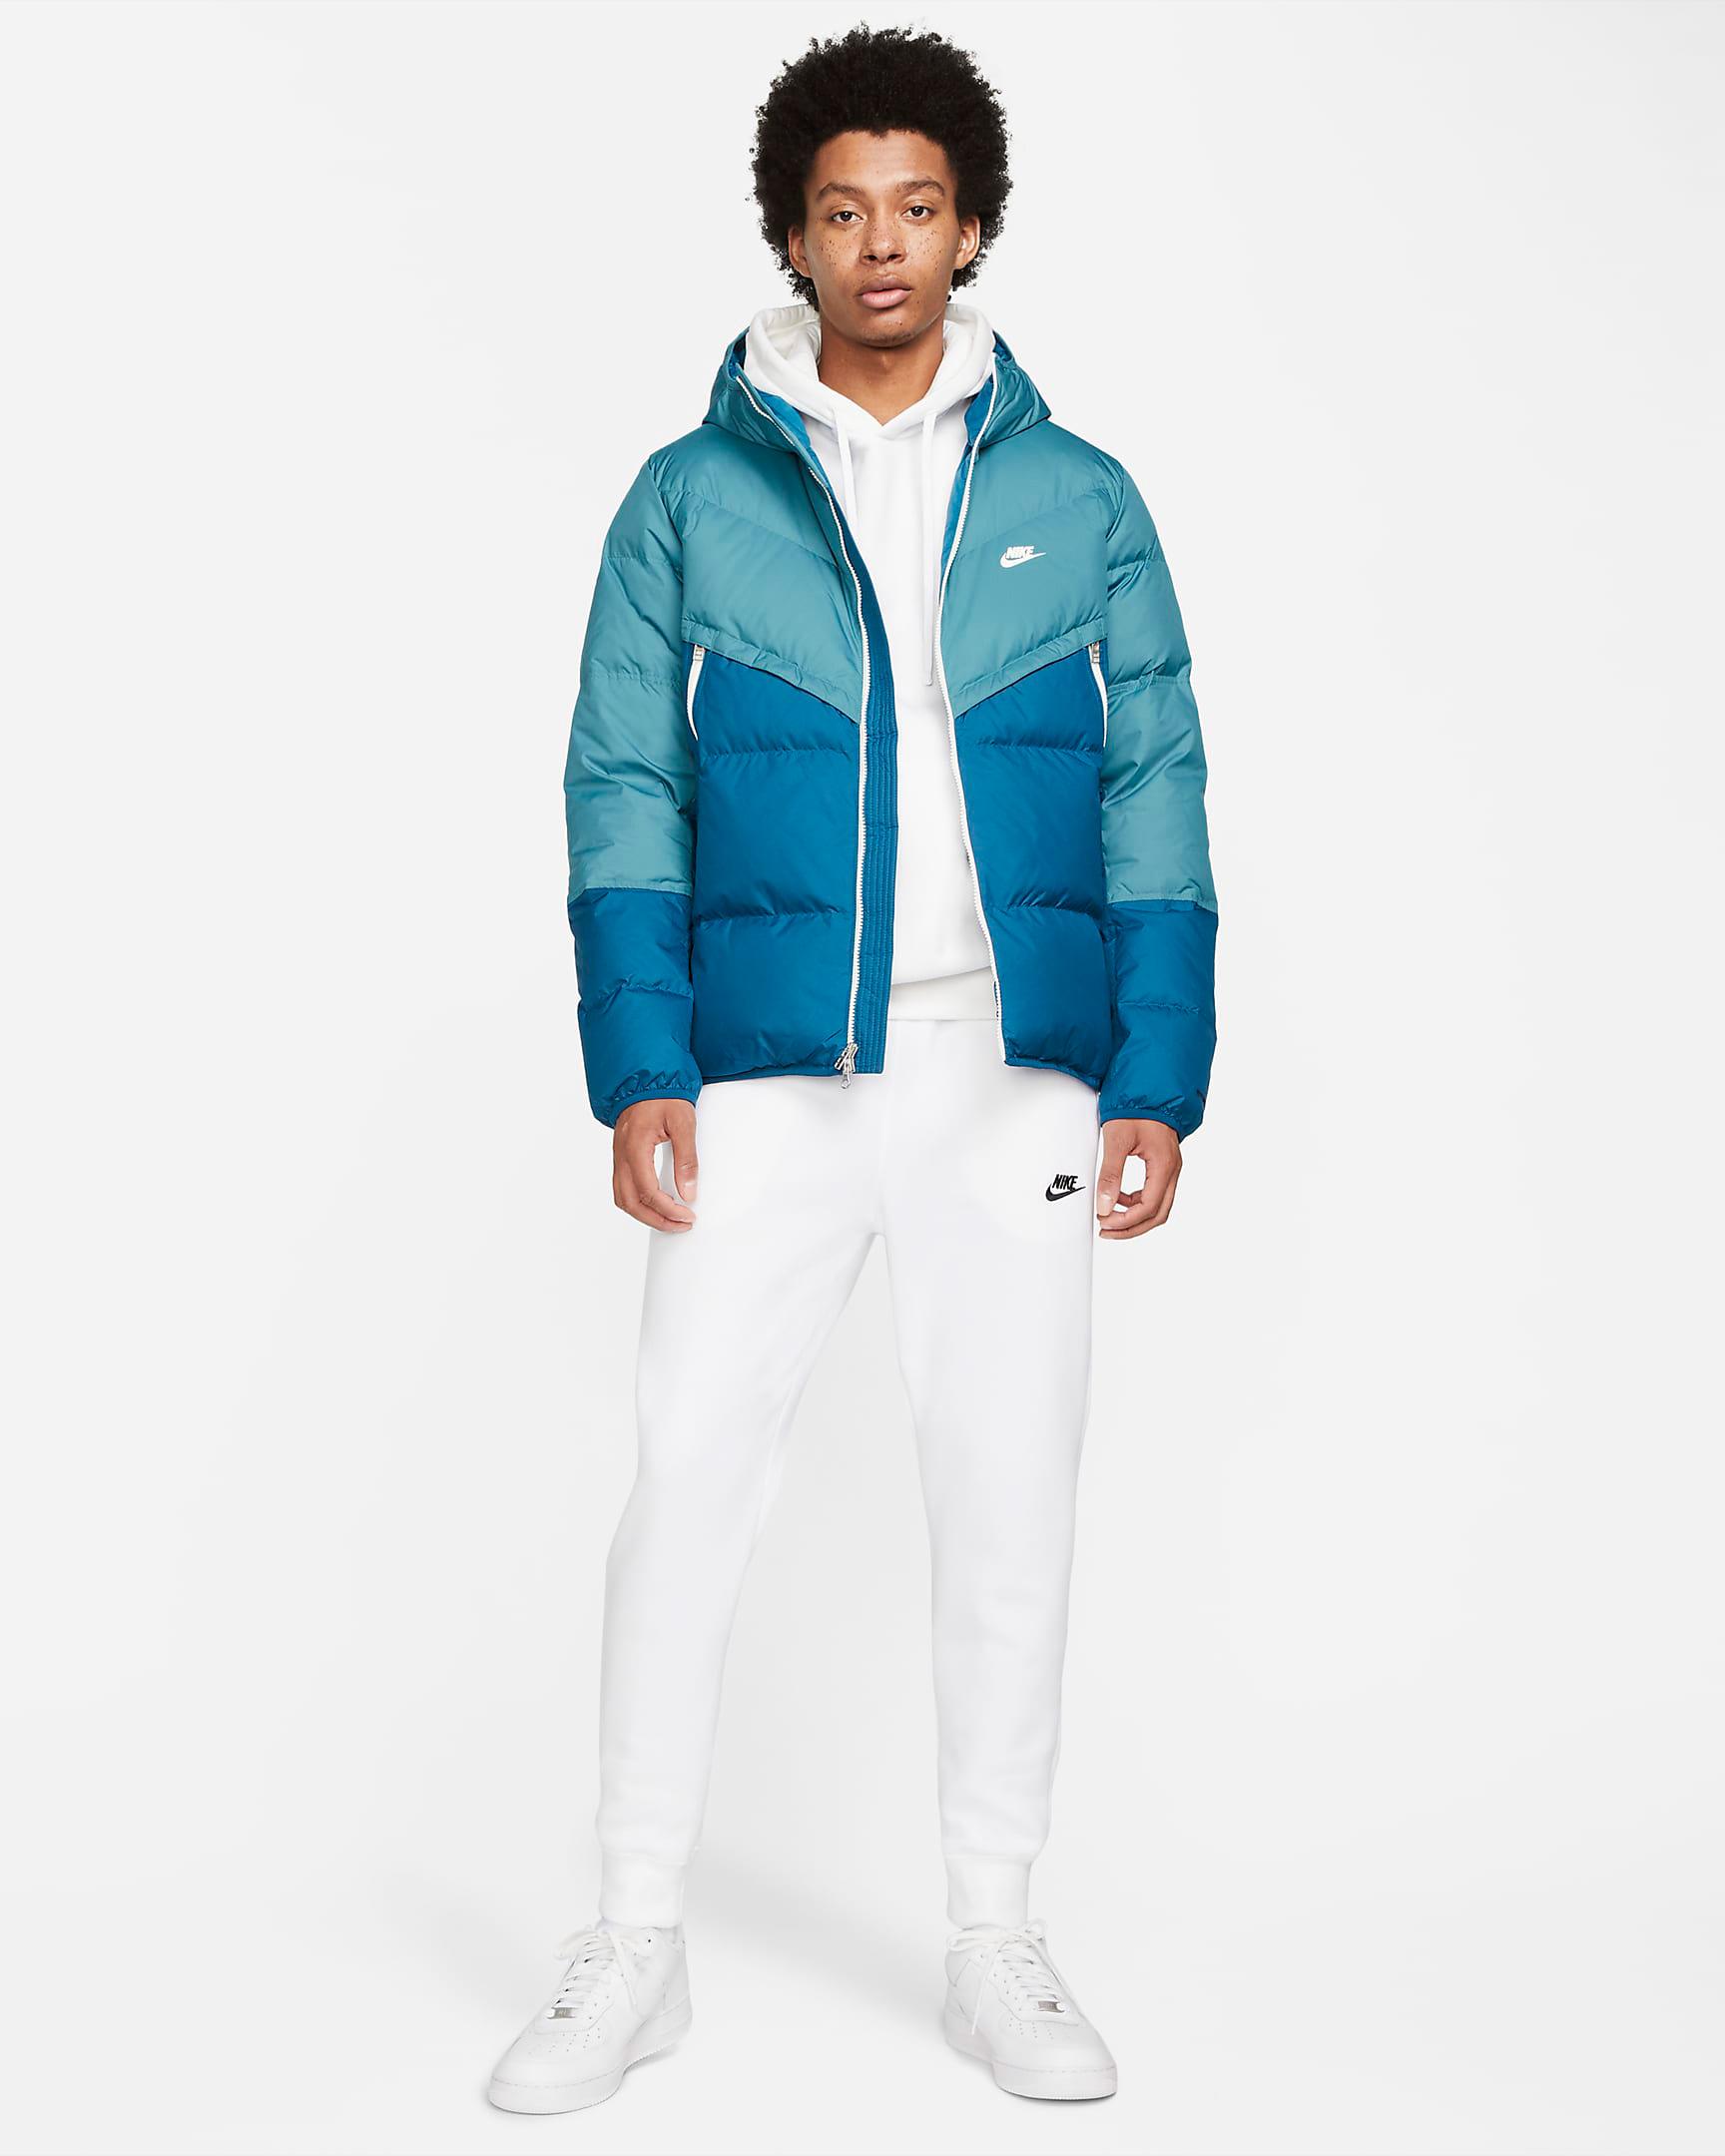 nike-rift-blue-windrunner-jacket-outfit